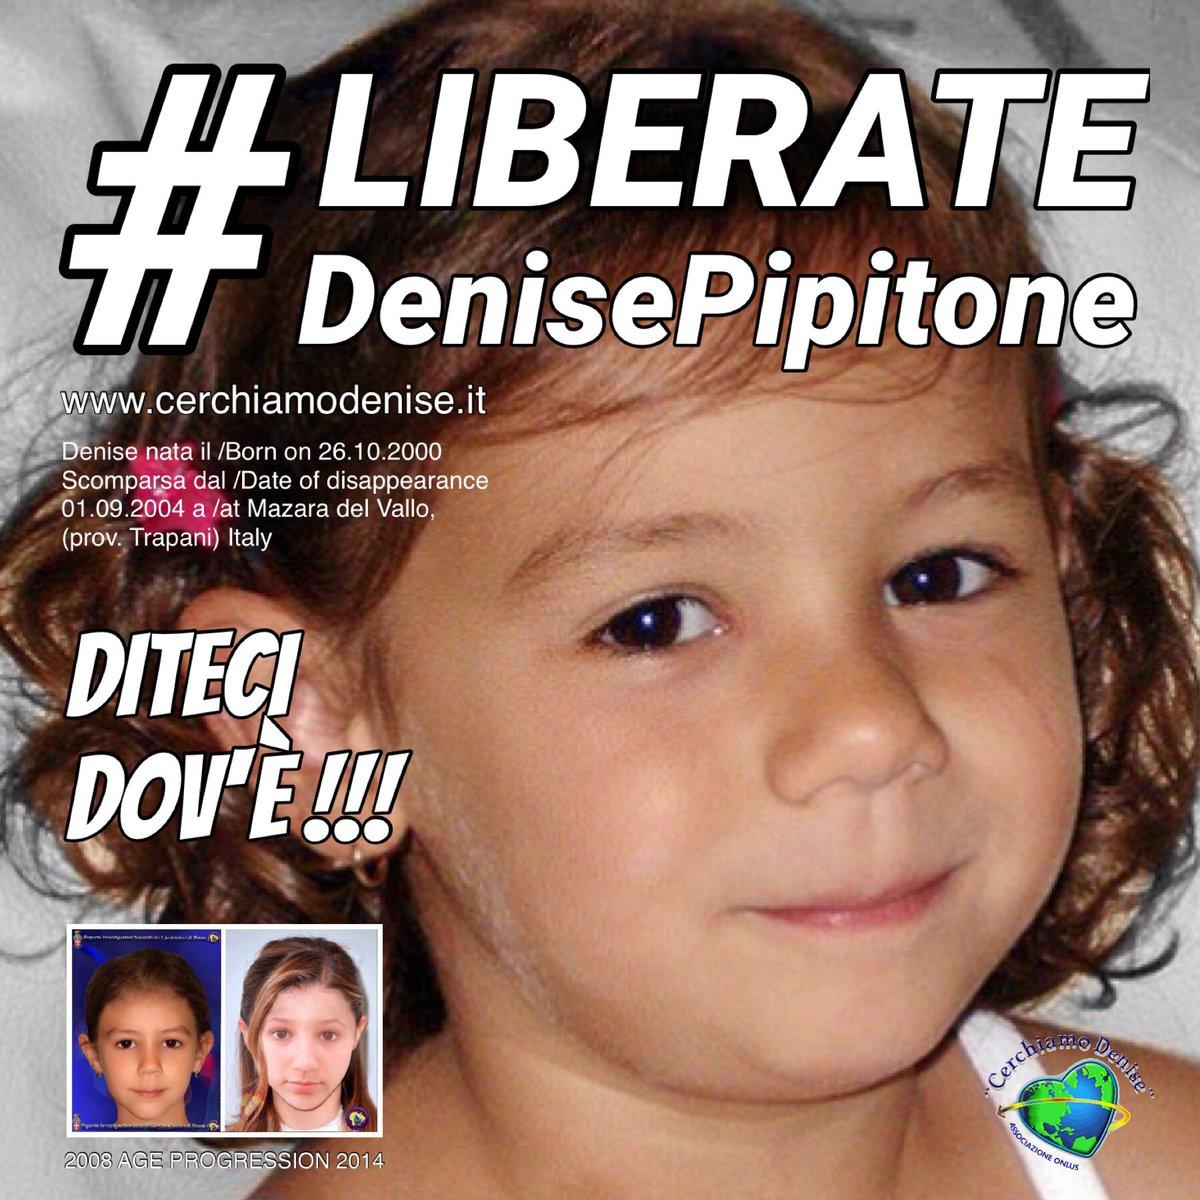 #LiberateDenisePipitone